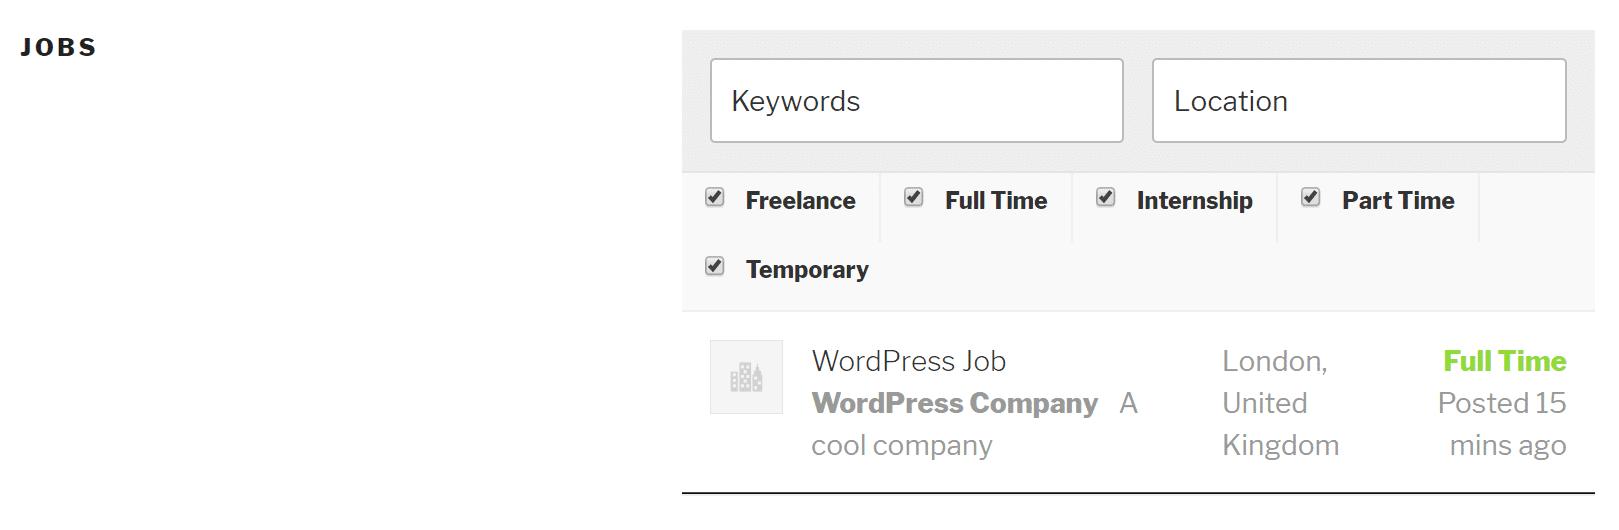 Candidate-se a emprego